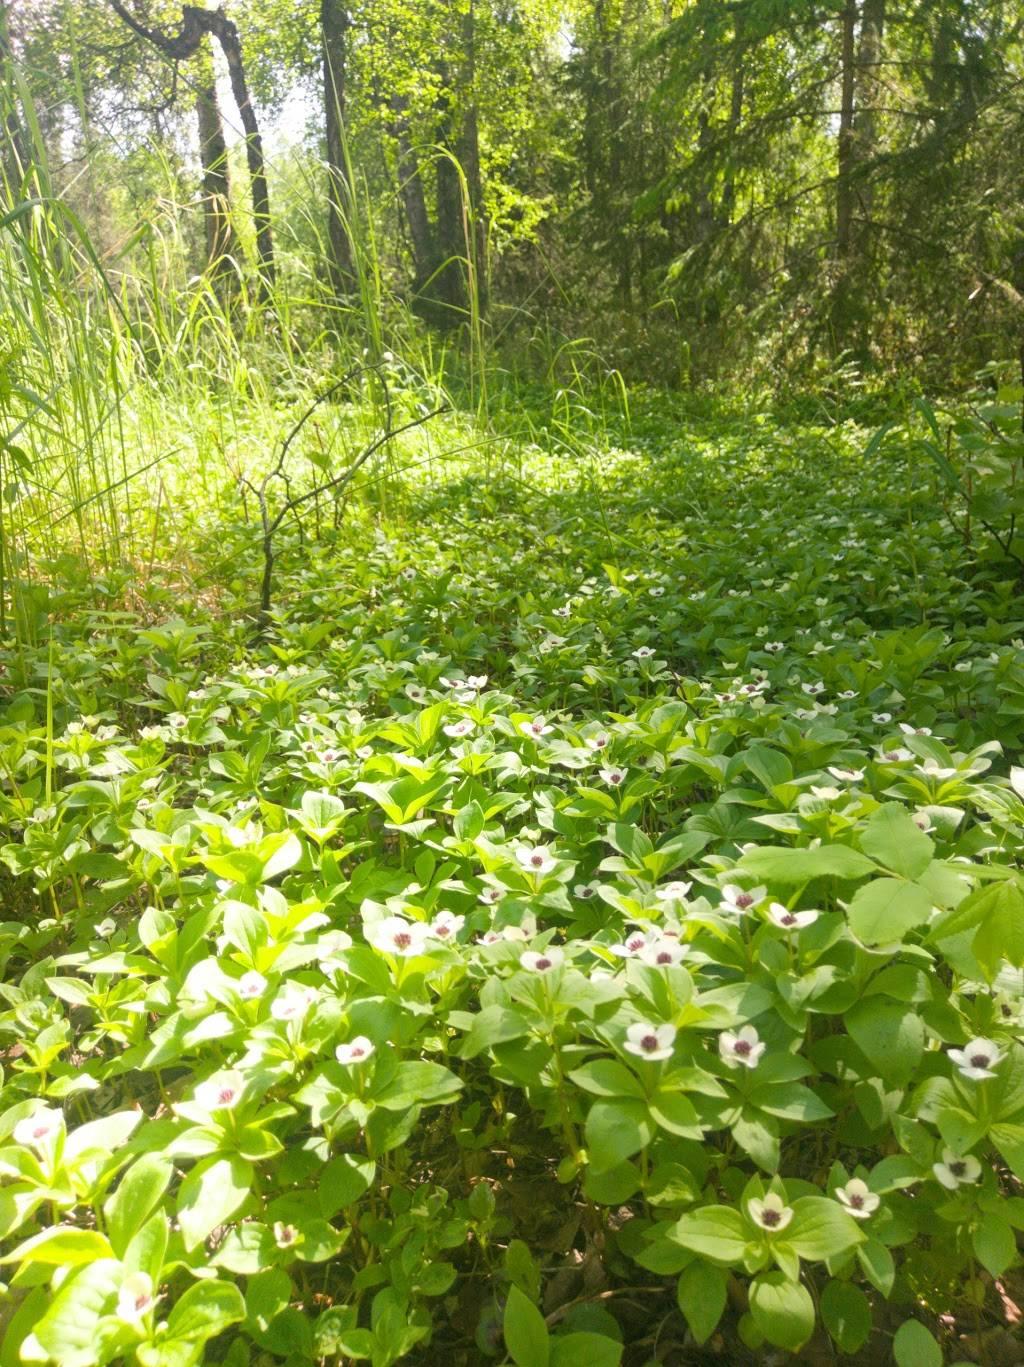 Arnold L. Muldoon Park - park  | Photo 1 of 8 | Address: 7600 E Northern Lights Blvd, Anchorage, AK 99504, USA | Phone: (907) 343-4355